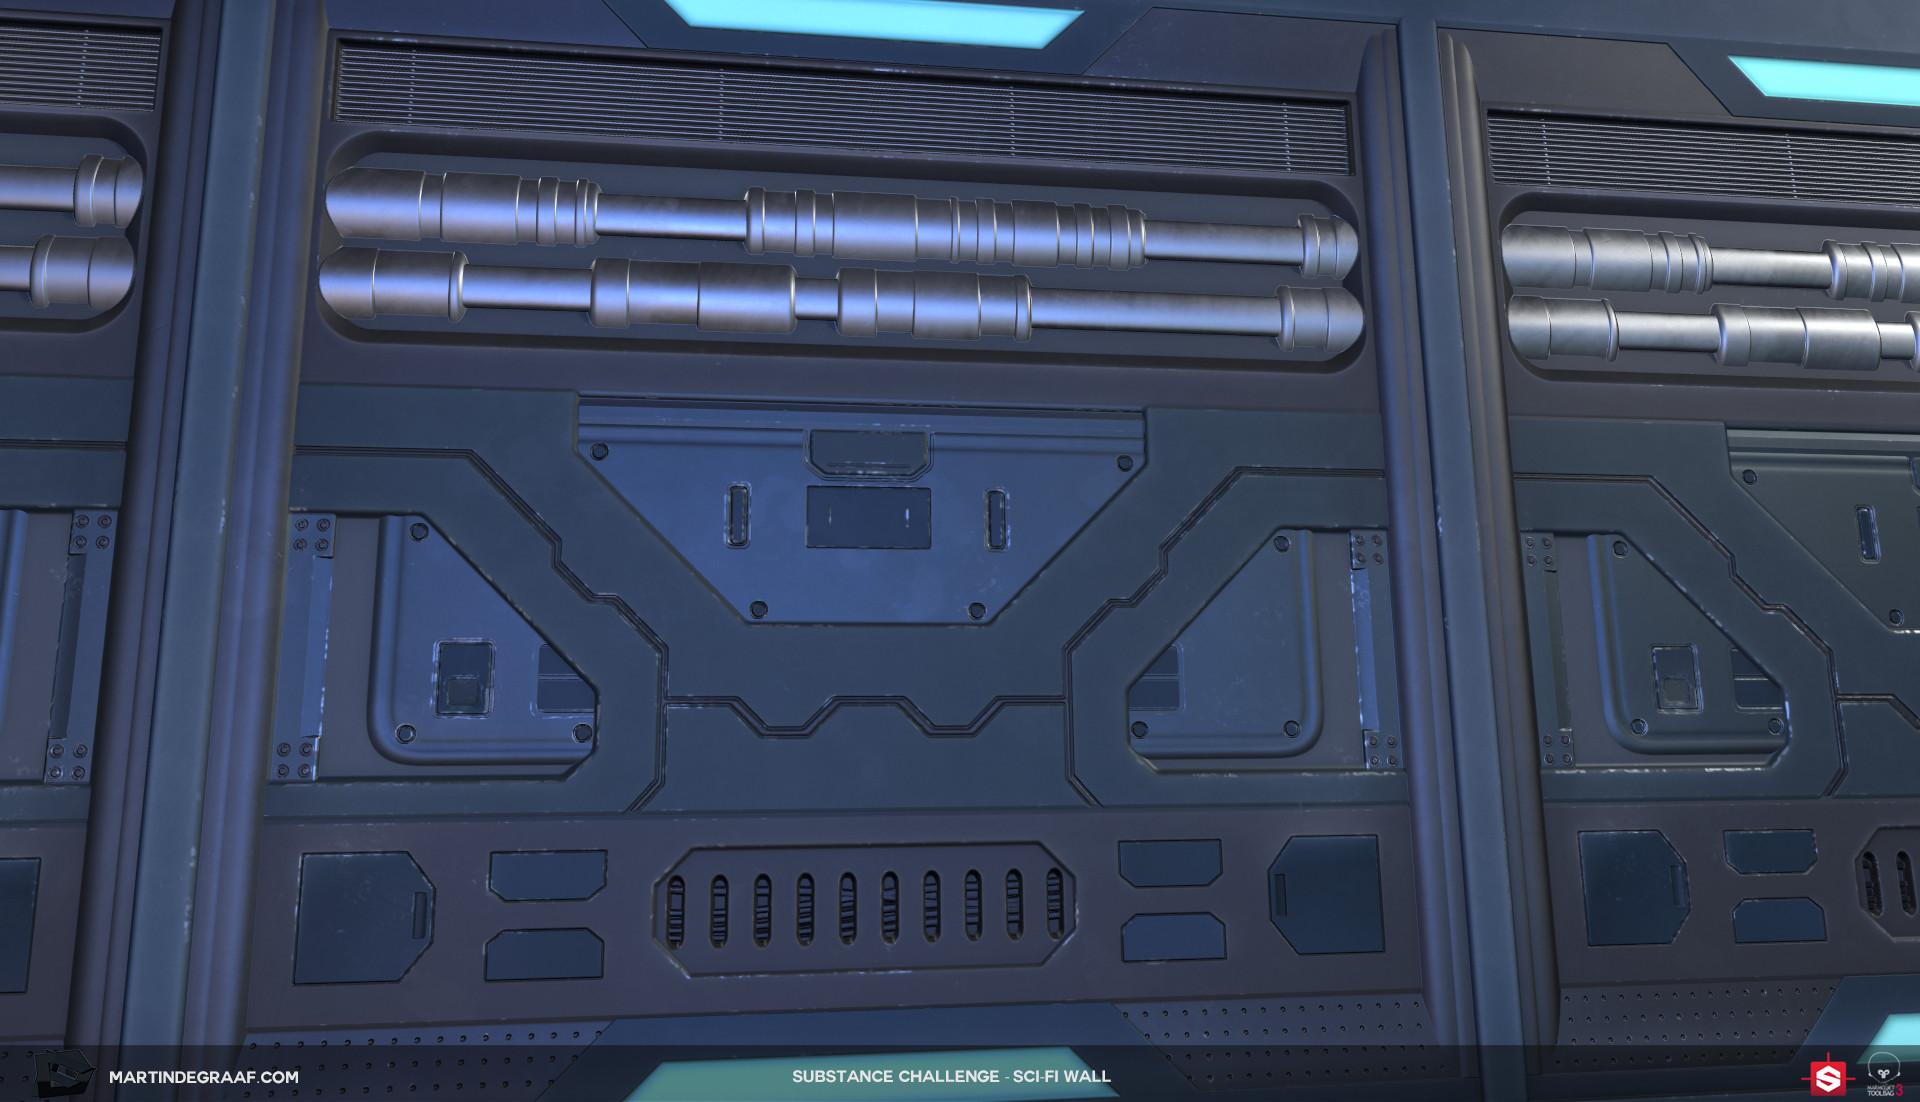 Martin de graaf substance challenge sci fi wall substance plane martin de graaf 2017